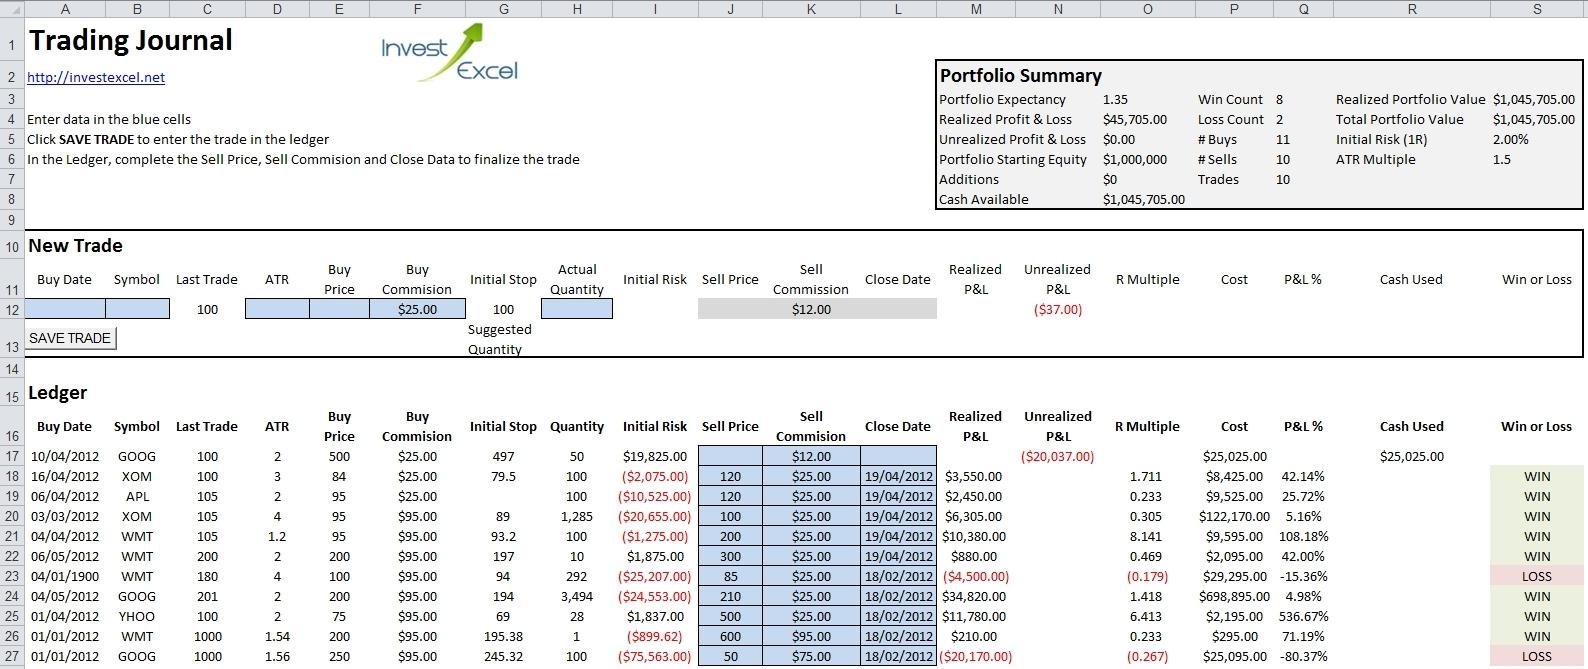 Trading P&l Spreadsheet | Onlyagame Inside Option Trading With Option Trading Spreadsheet